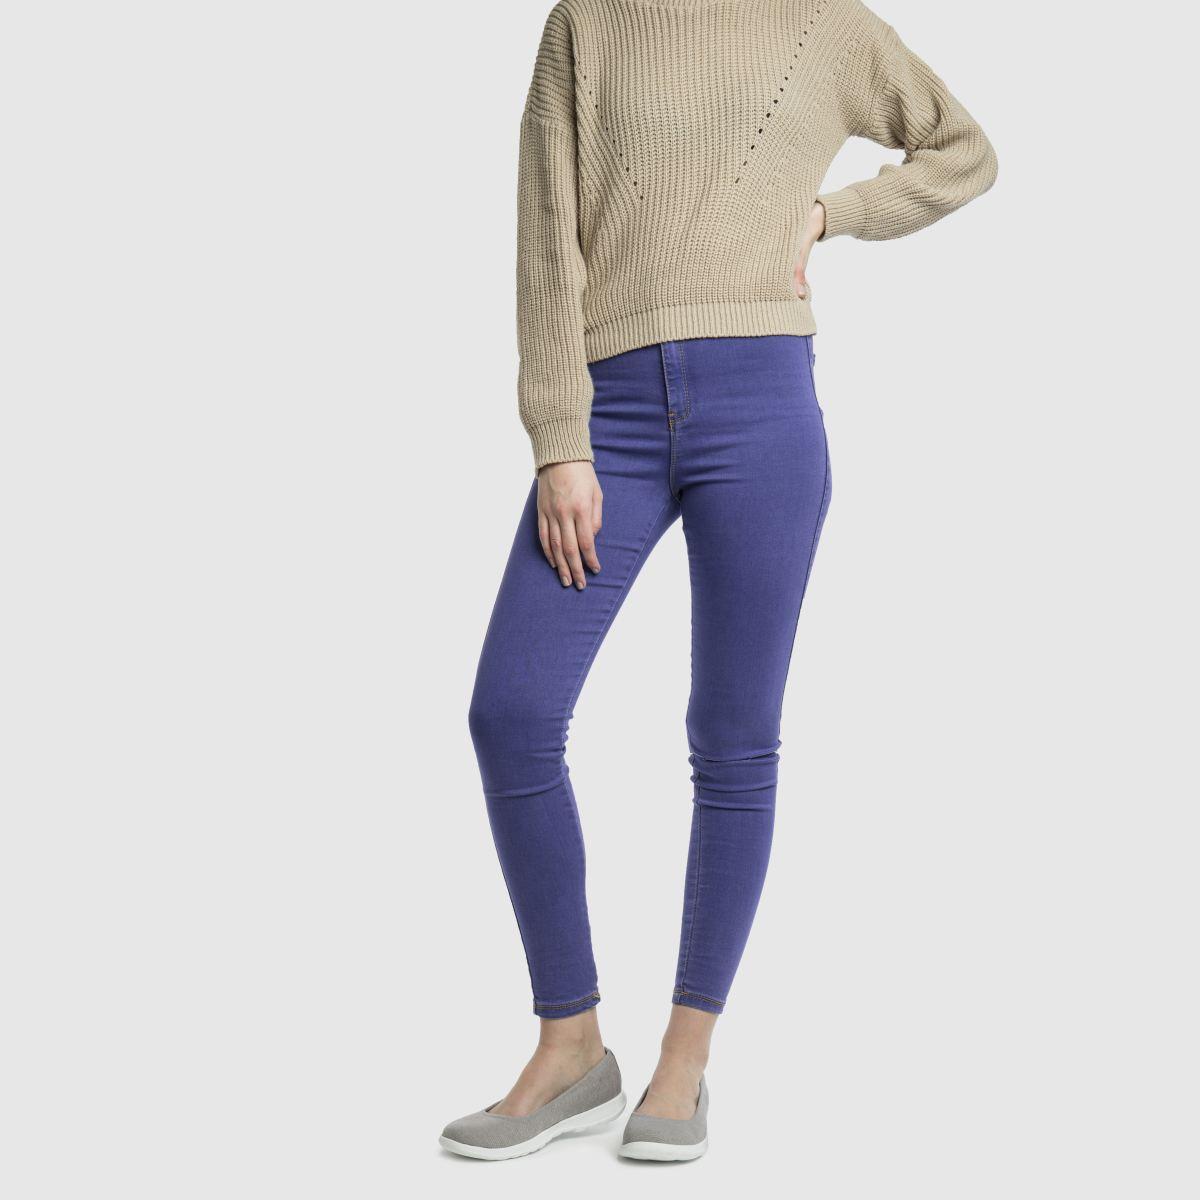 Damen Grau skechers Go Walk Lite Enamored Sneaker | schuh Gute Qualität beliebte Schuhe